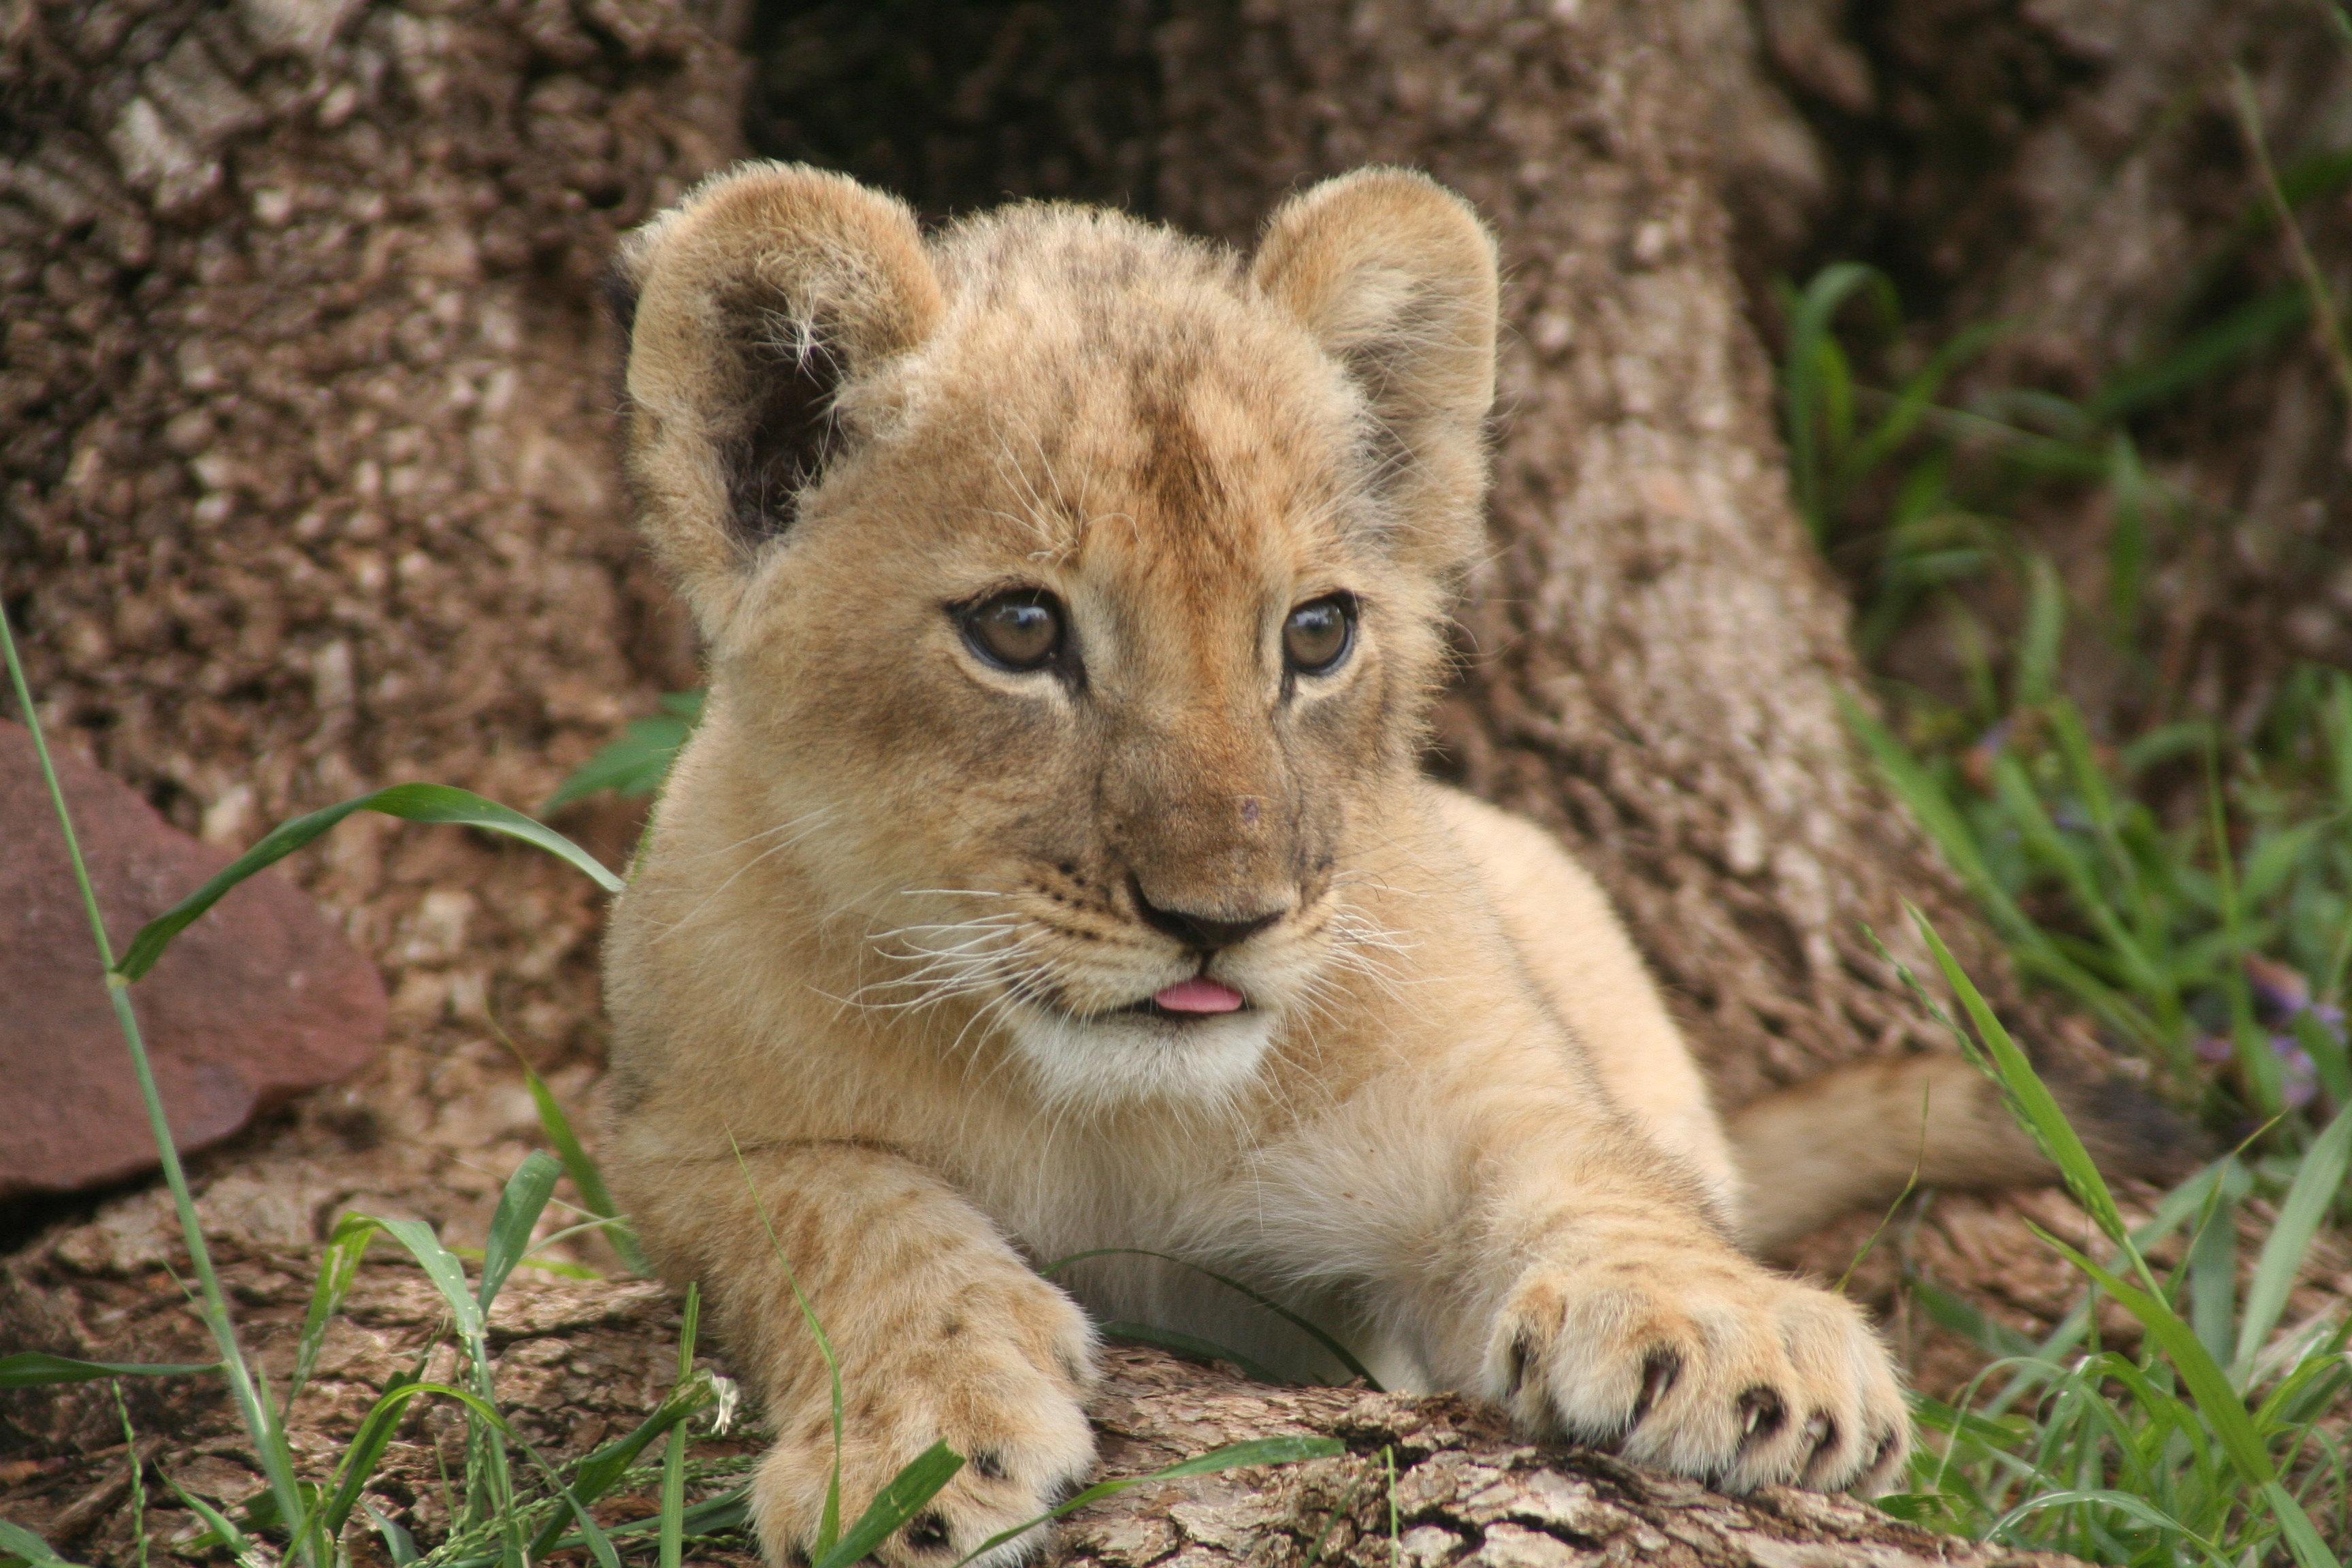 Cute Puppies Wallpaper 1080p Horseback Africa Cute Baby Lion